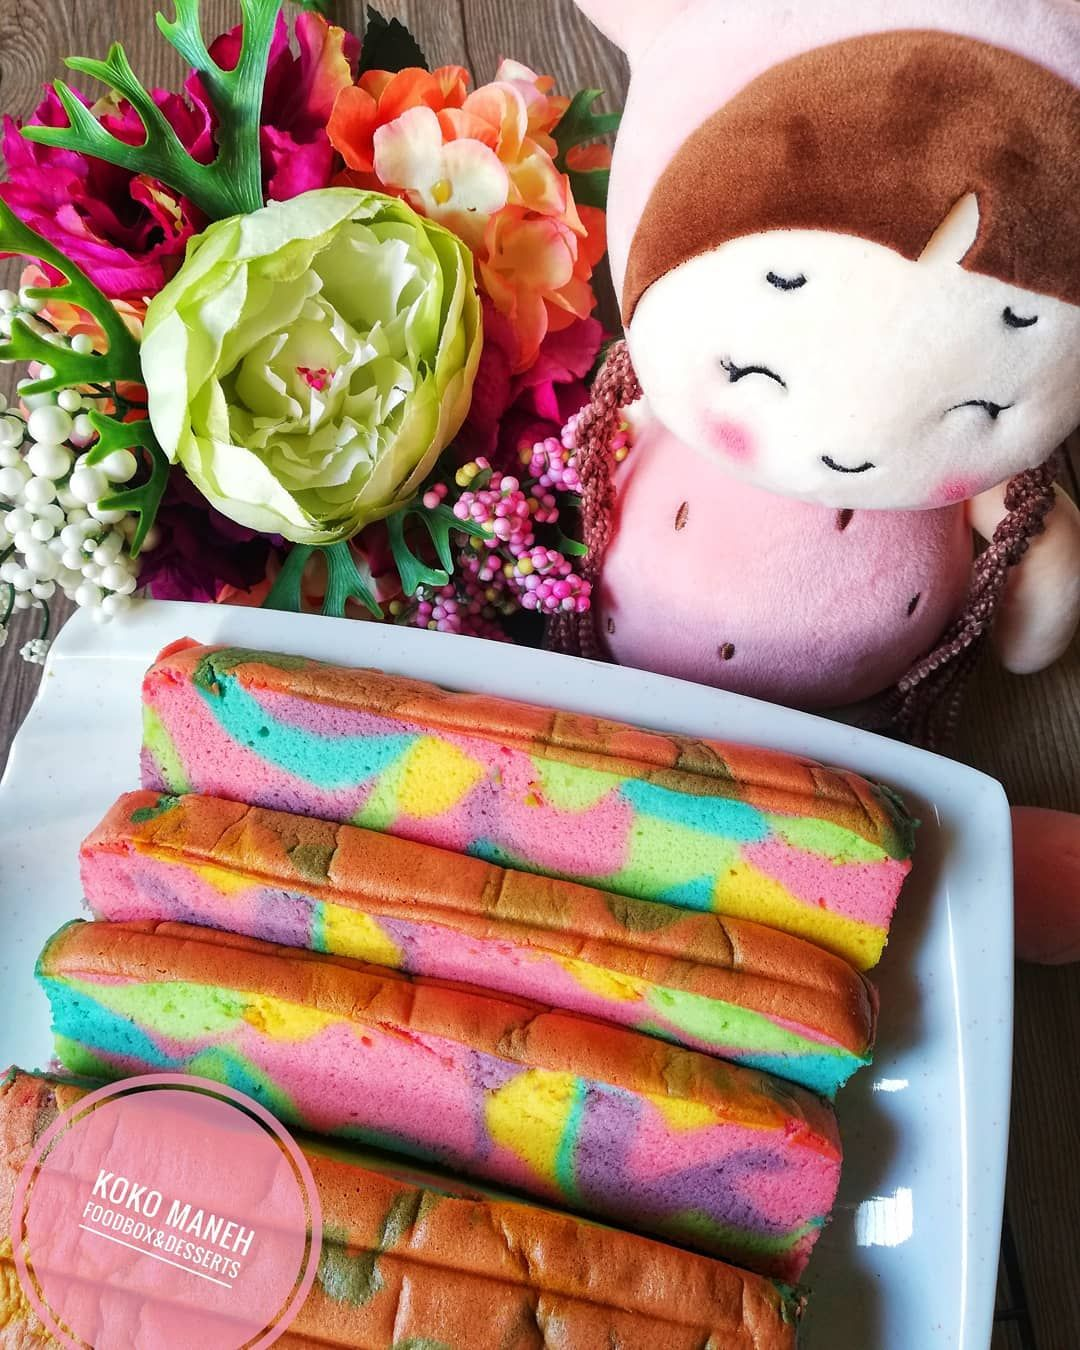 Unicorn Ogura Cake Rupa Mcm Spongecake Tapi Step By Step Nak Buat Dia Mcm Chiffon Cake Pastu Nak Bake Dia Pulak Sama Mcm Japanese Cotton Cake Haaa Boleh